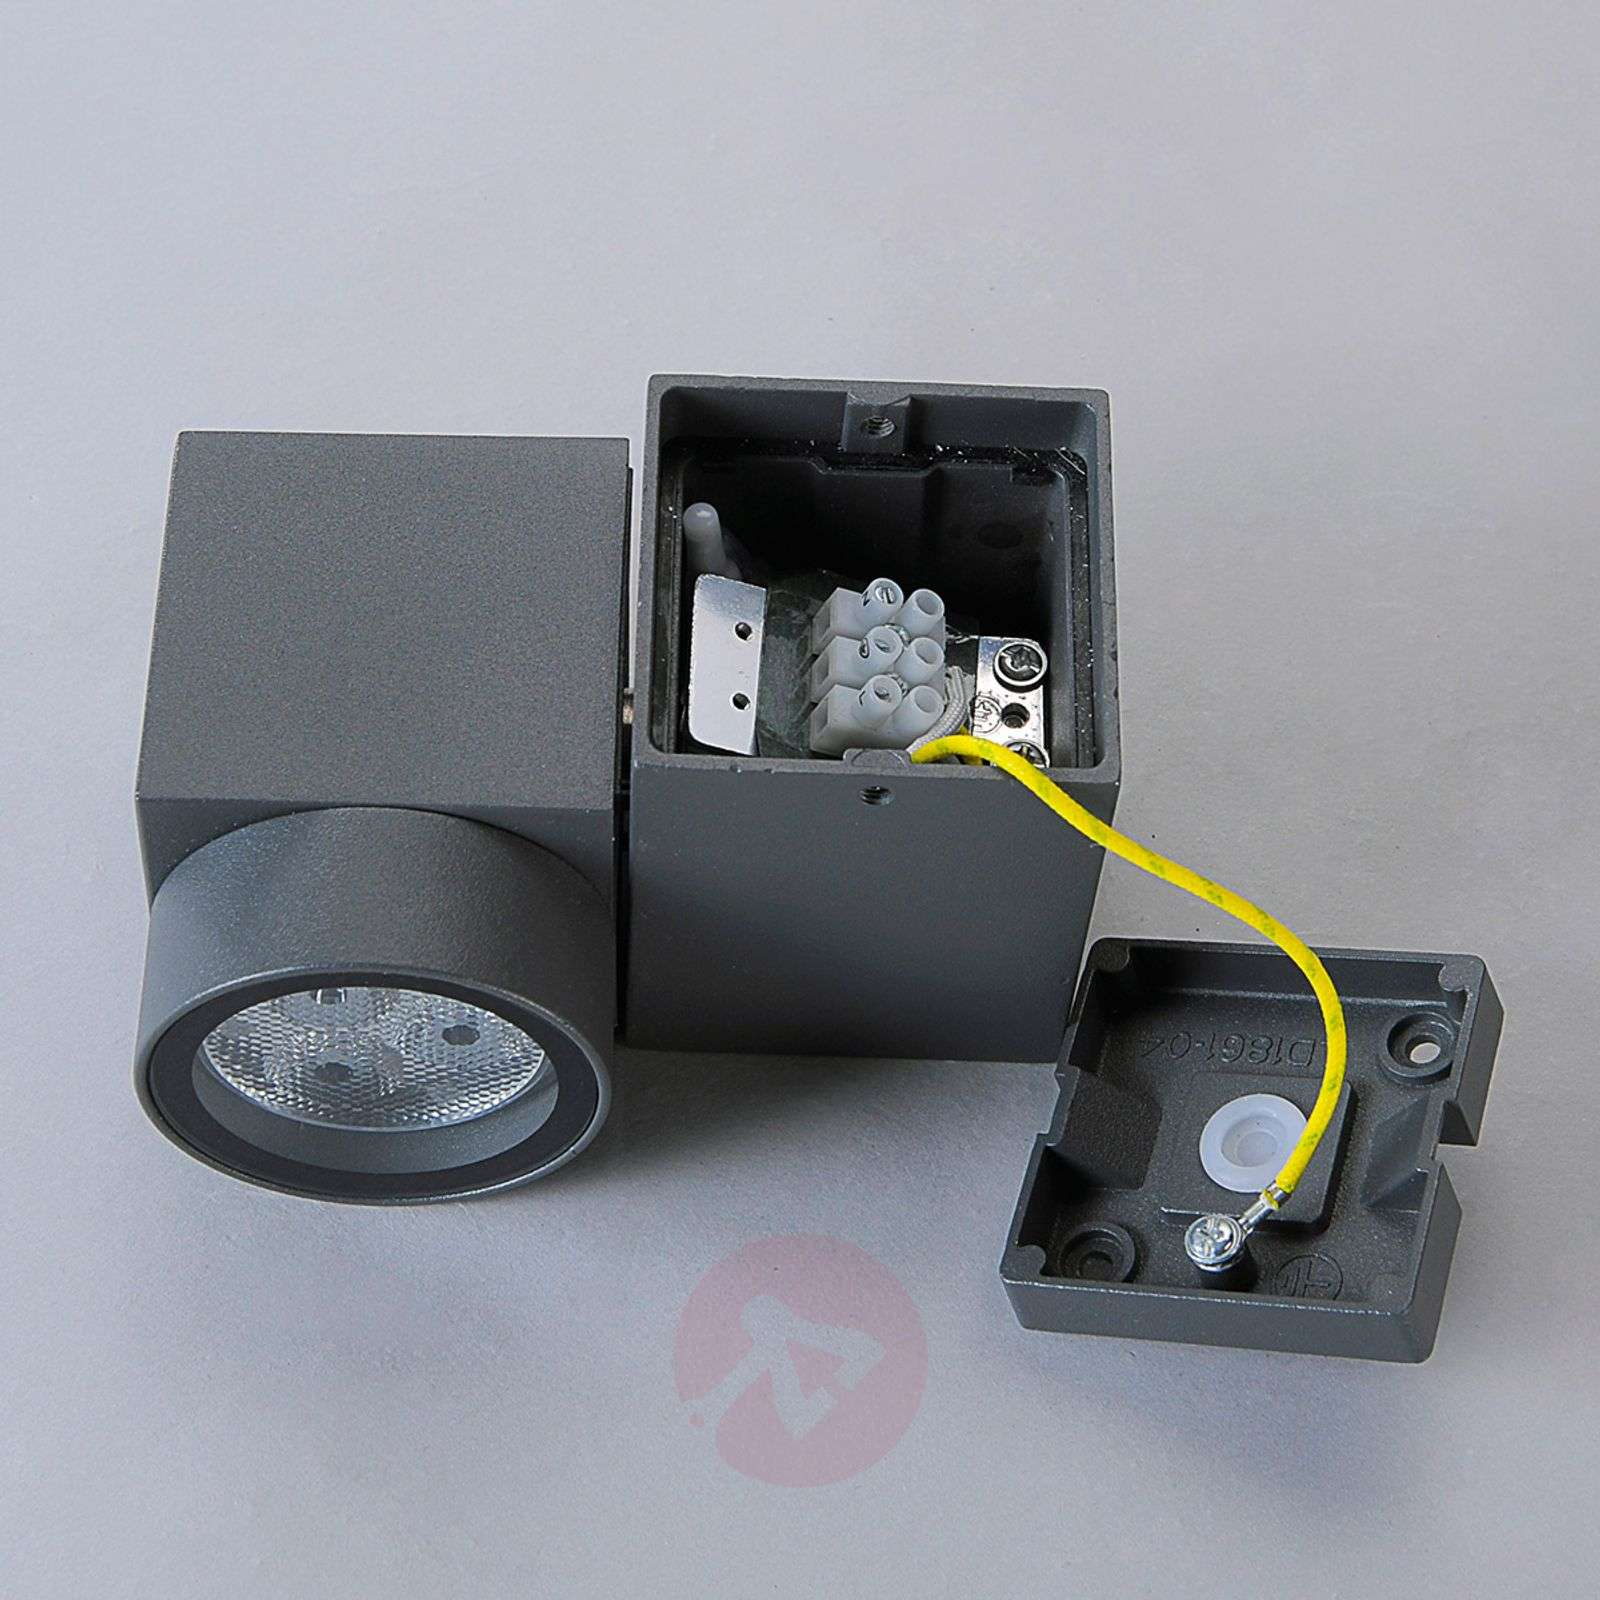 Adjustable LED outdoor spotlight Lorelle-9618048-01